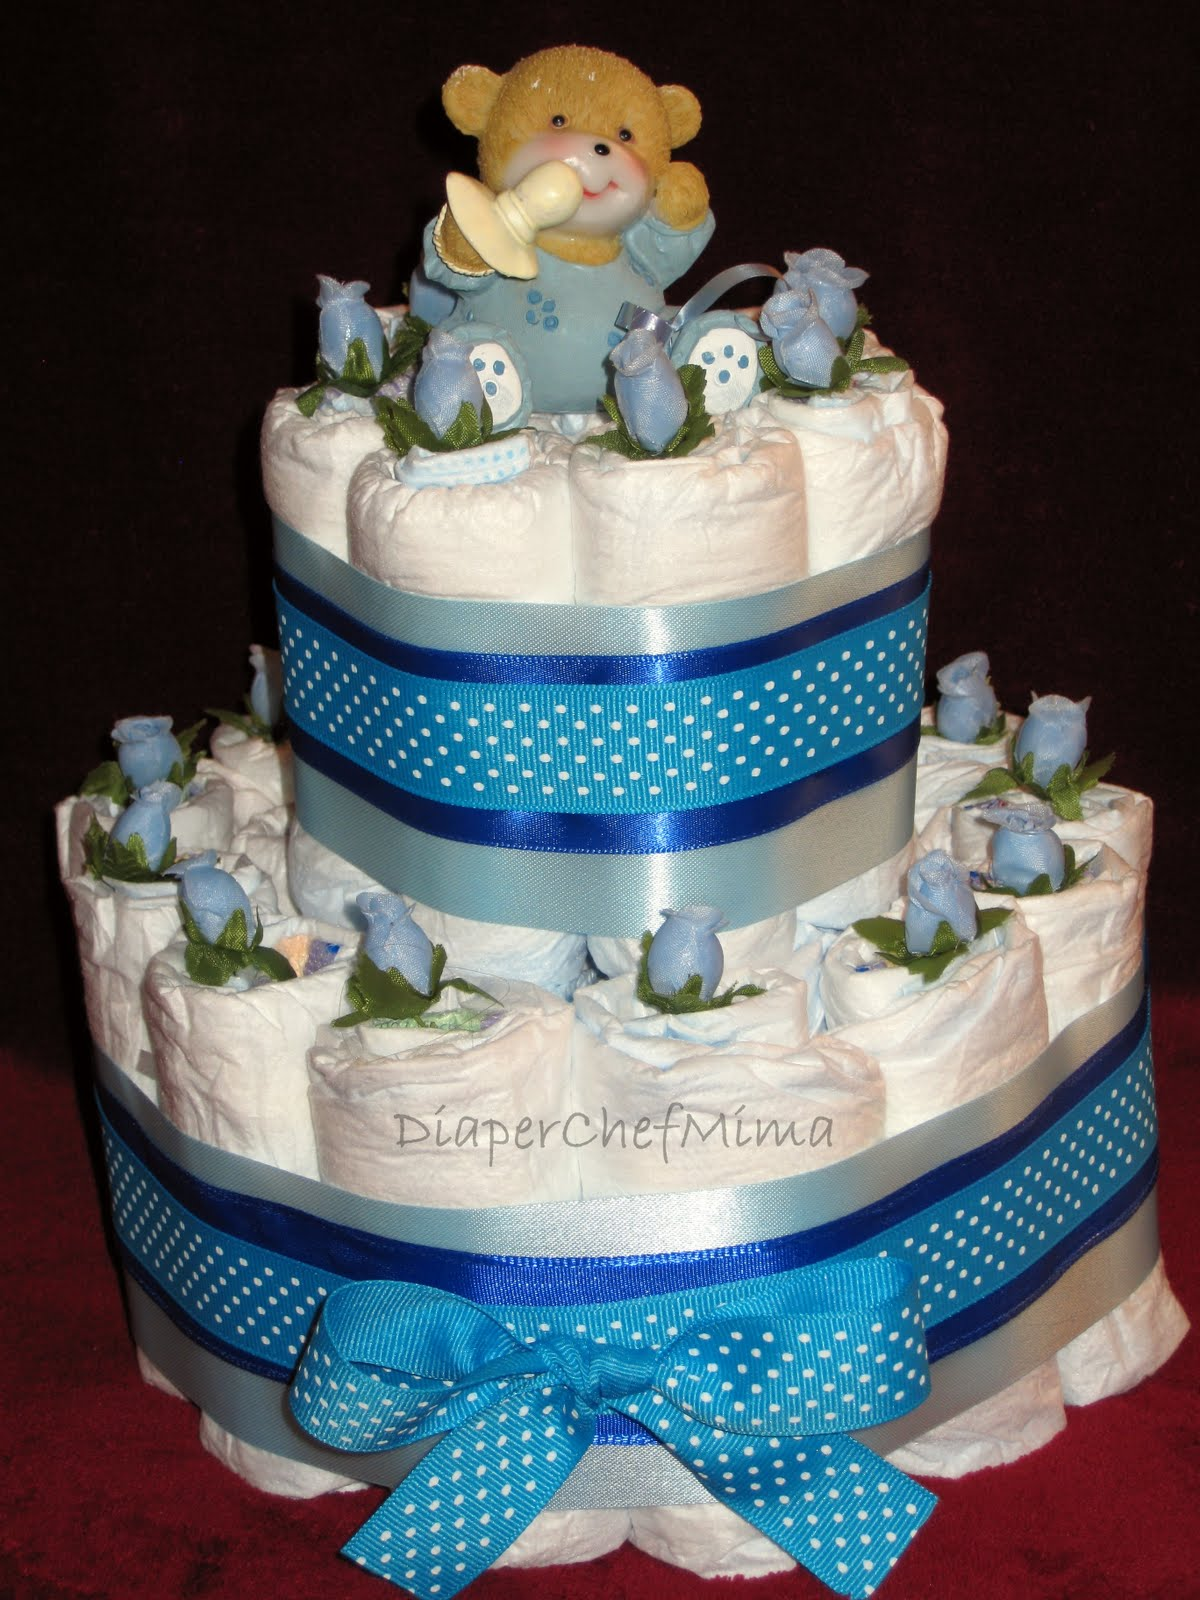 Diaper Chef Mima Baby Shower Diaper Cake Centerpieces